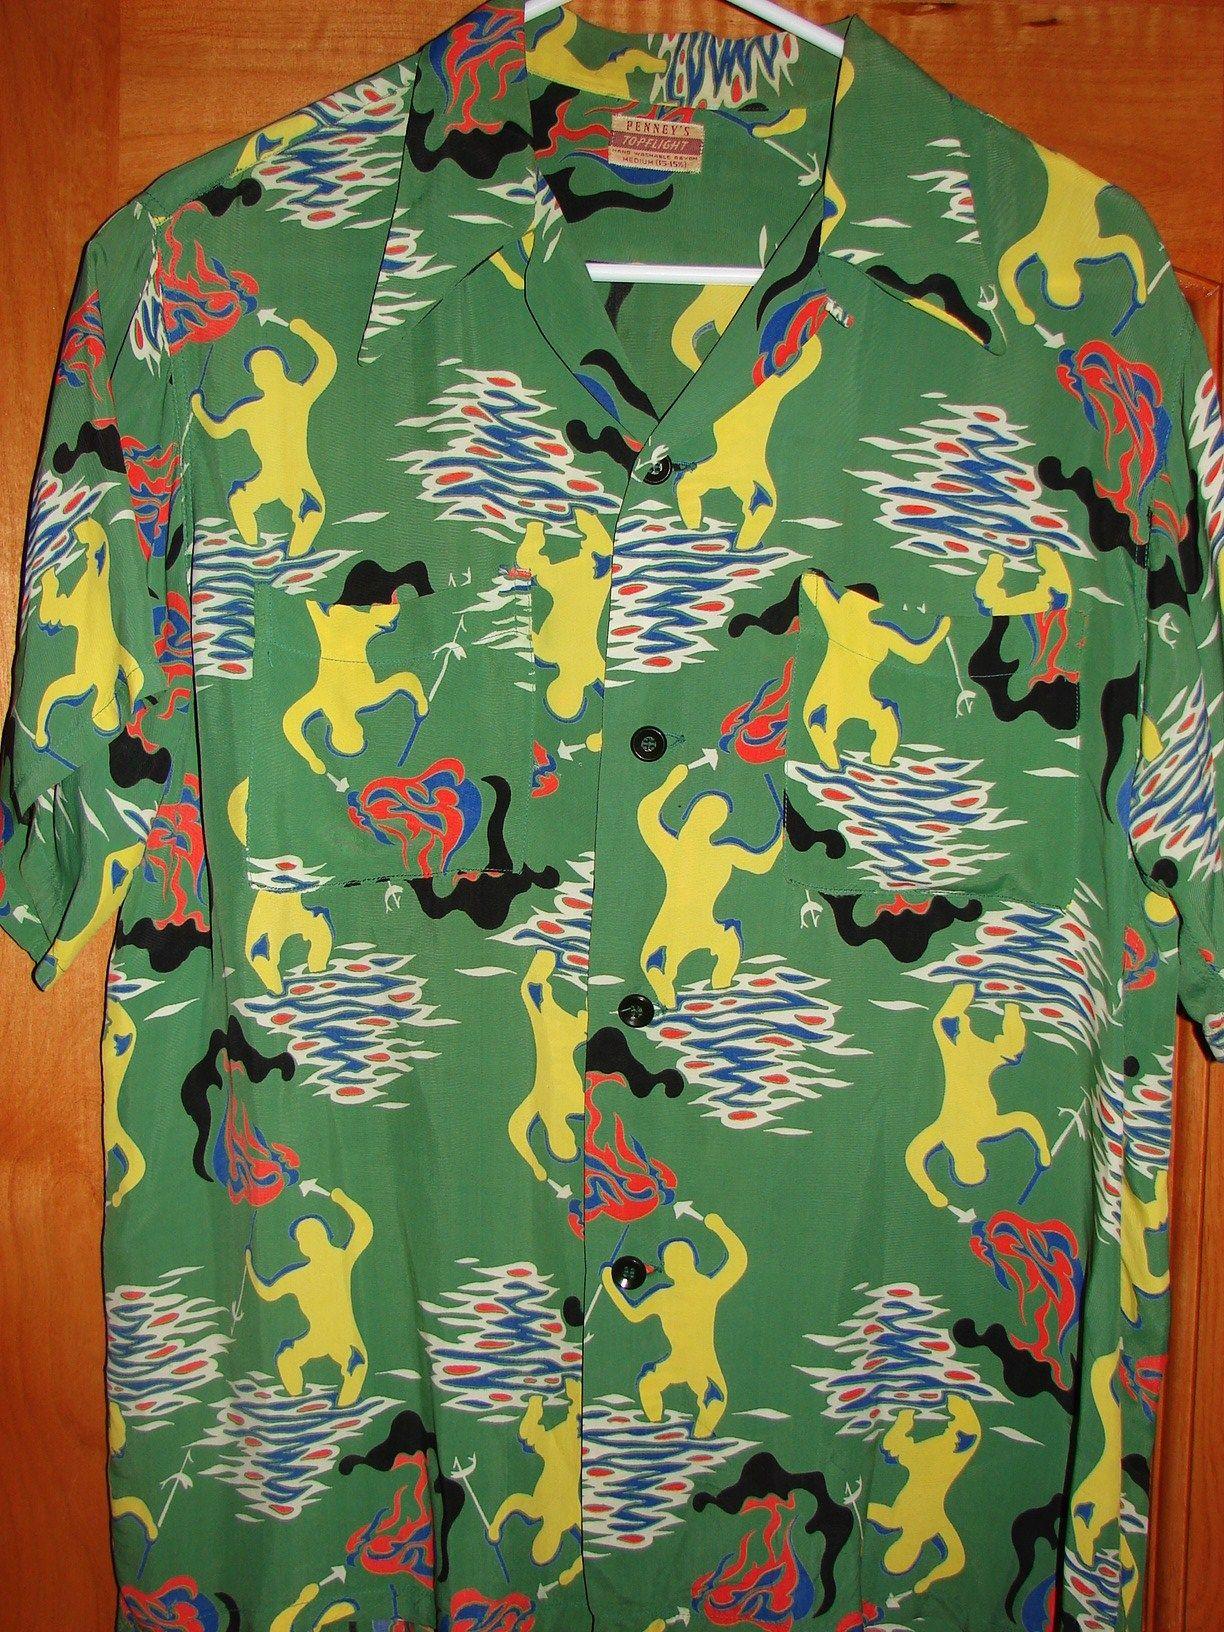 f5c1f1e9 Penny's - 40s Torch Fisherman Rayon Vintage Aloha Shirt - TheHanaShirtCo